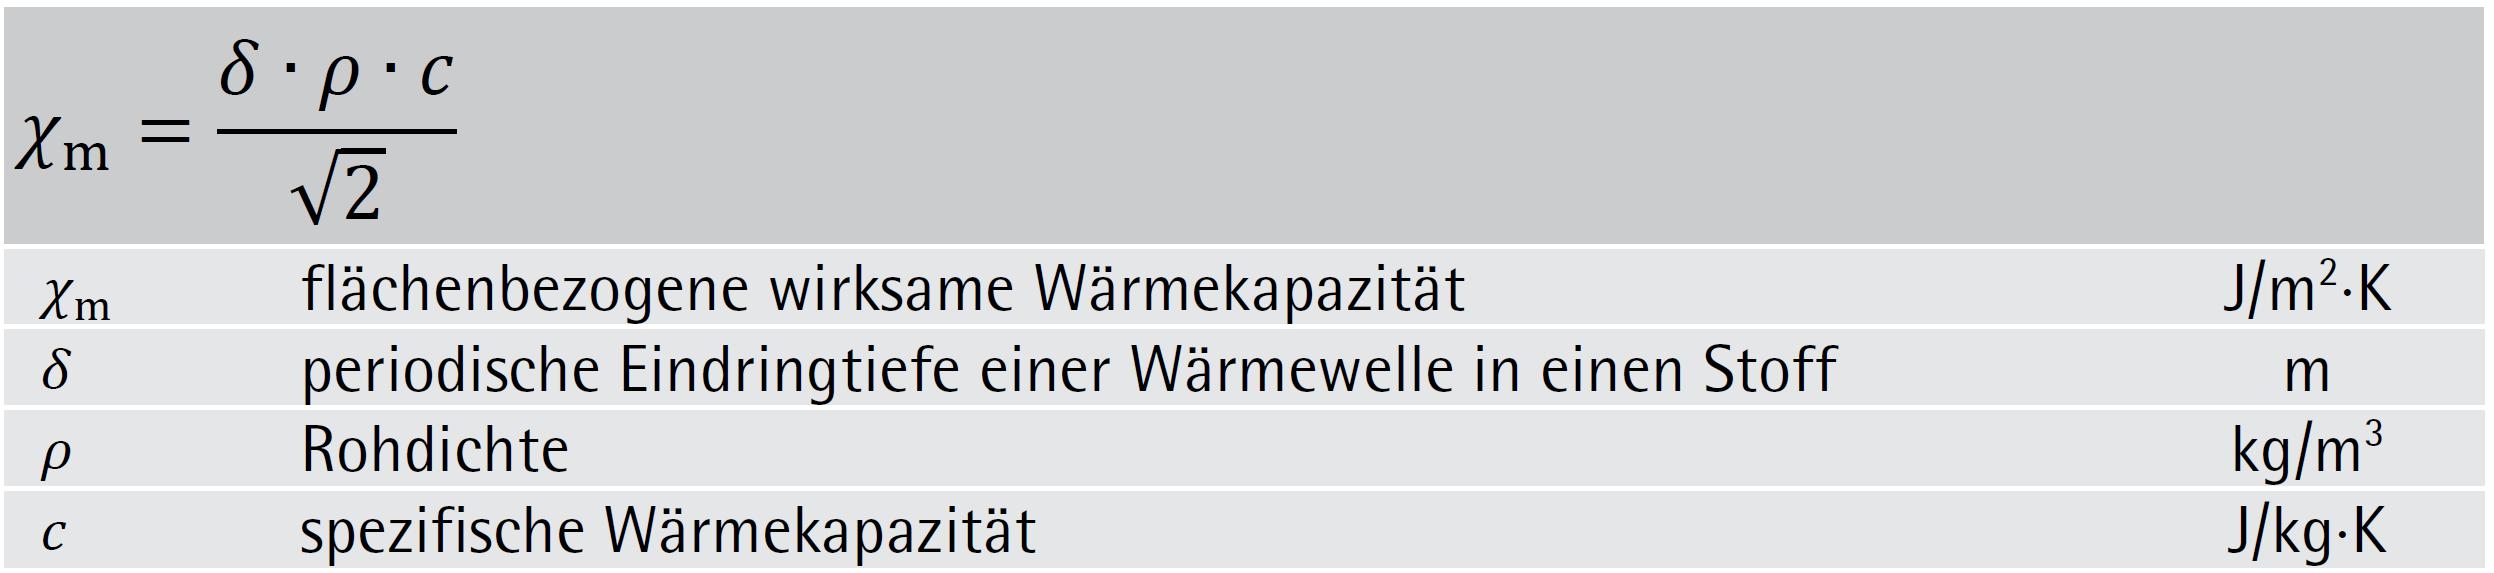 Formel Flächenbezogene wirksame Wärmekapazität